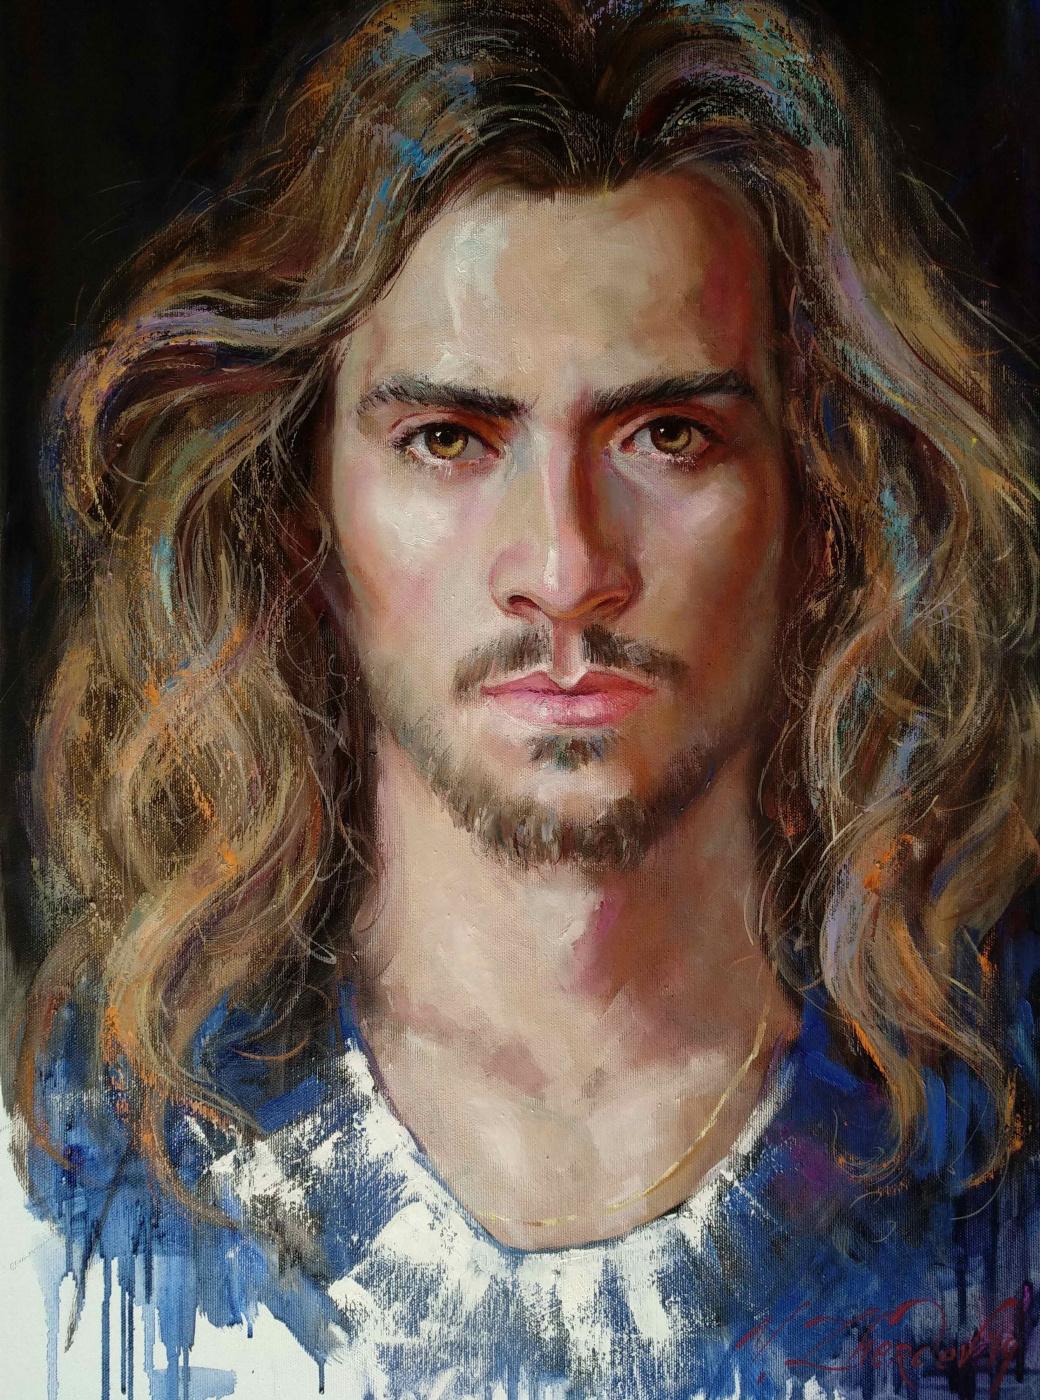 Виталий Викторович Жердев. Portrait of the Italian actor and singer Luca Giacomelli Ferrarini